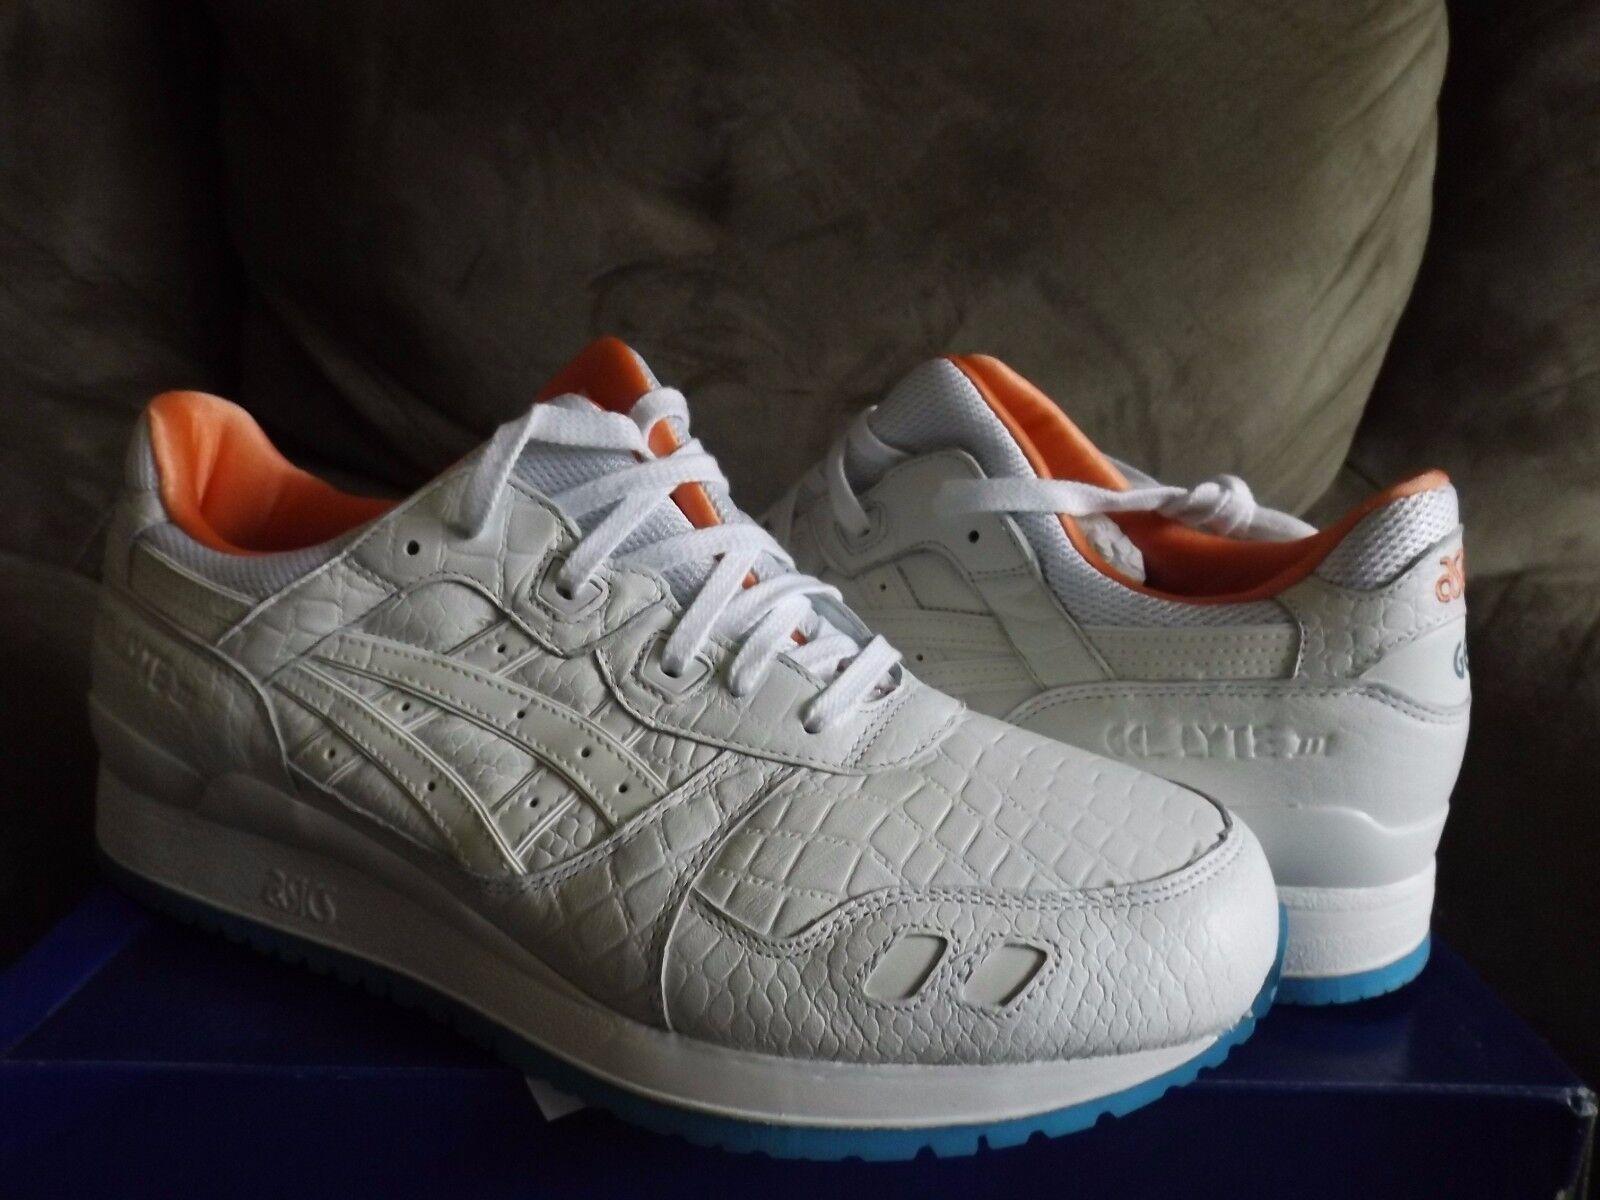 Asics Gel-lyte III Men's Running Shoes Miami Vice White H540L 0101 New w/Box